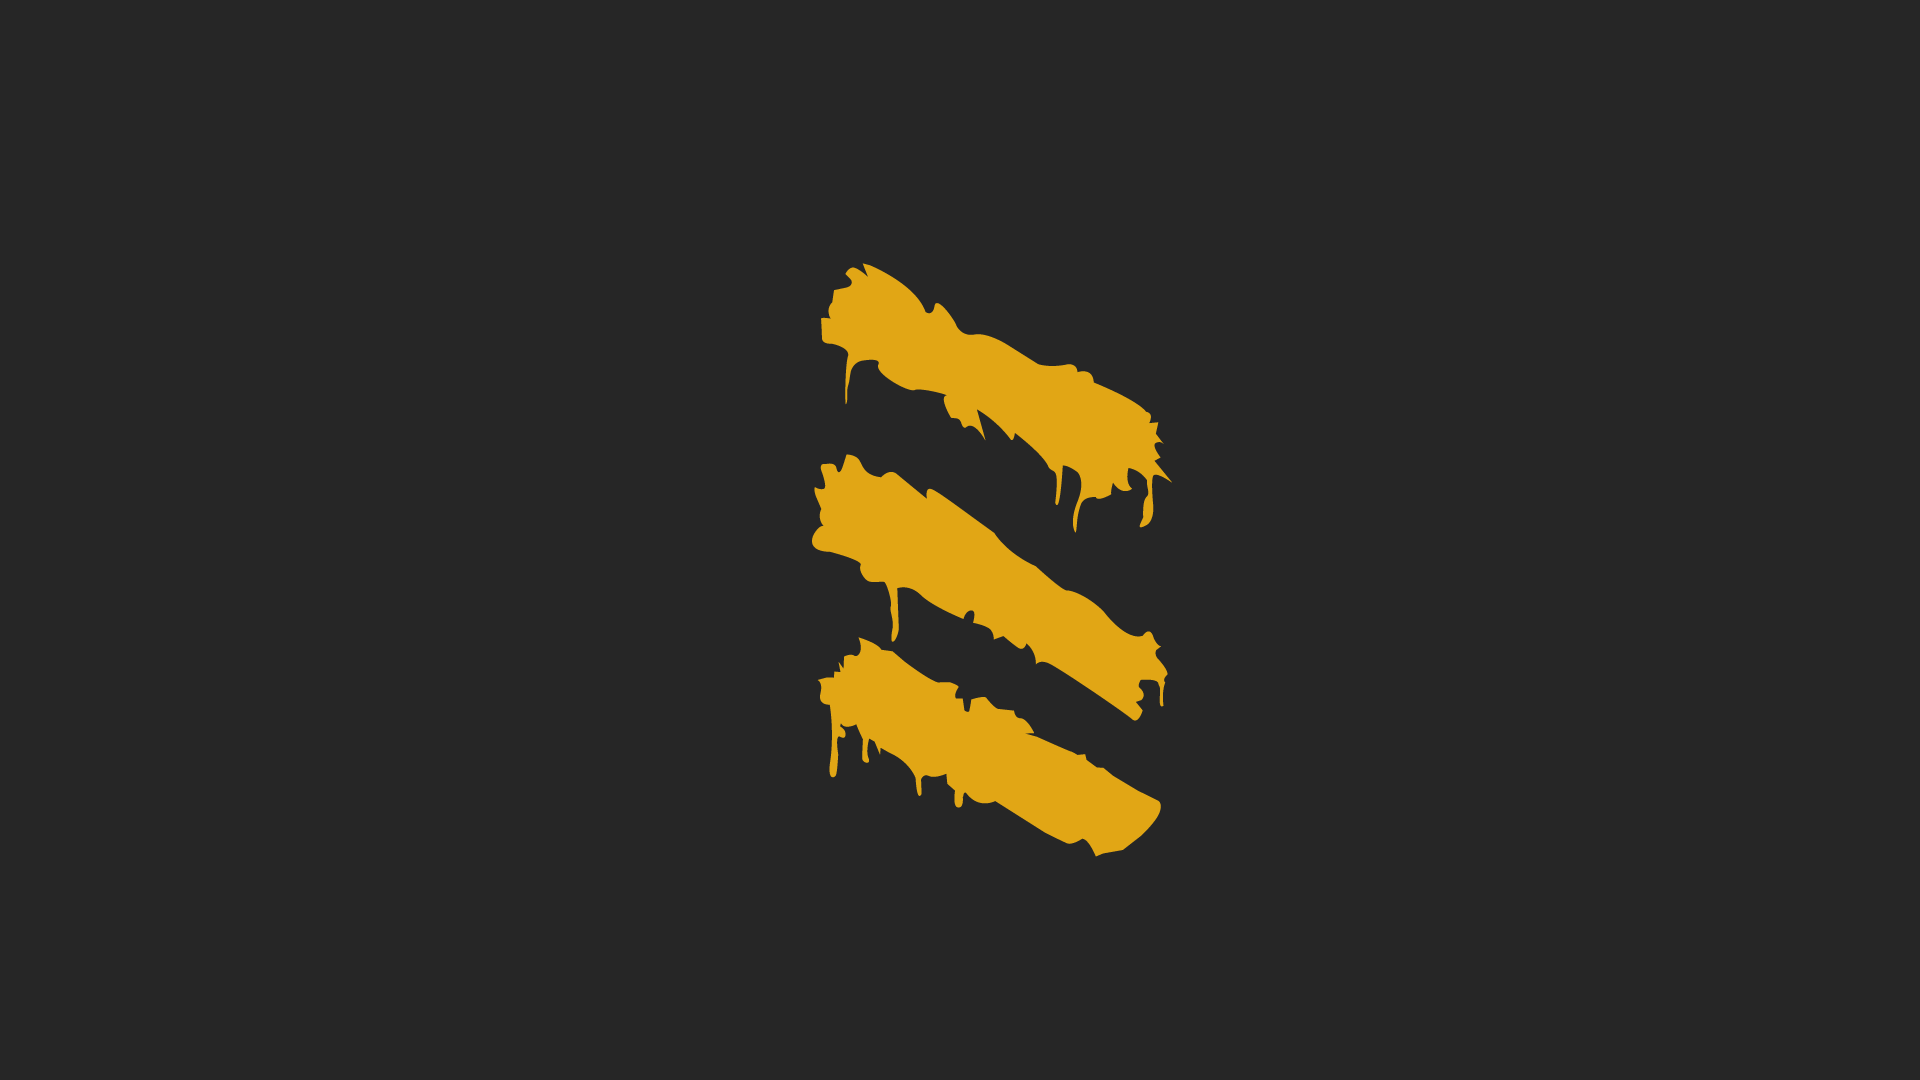 Dying Light Rais Gang Symbol Desktop Wallpaper By Xtraterr On